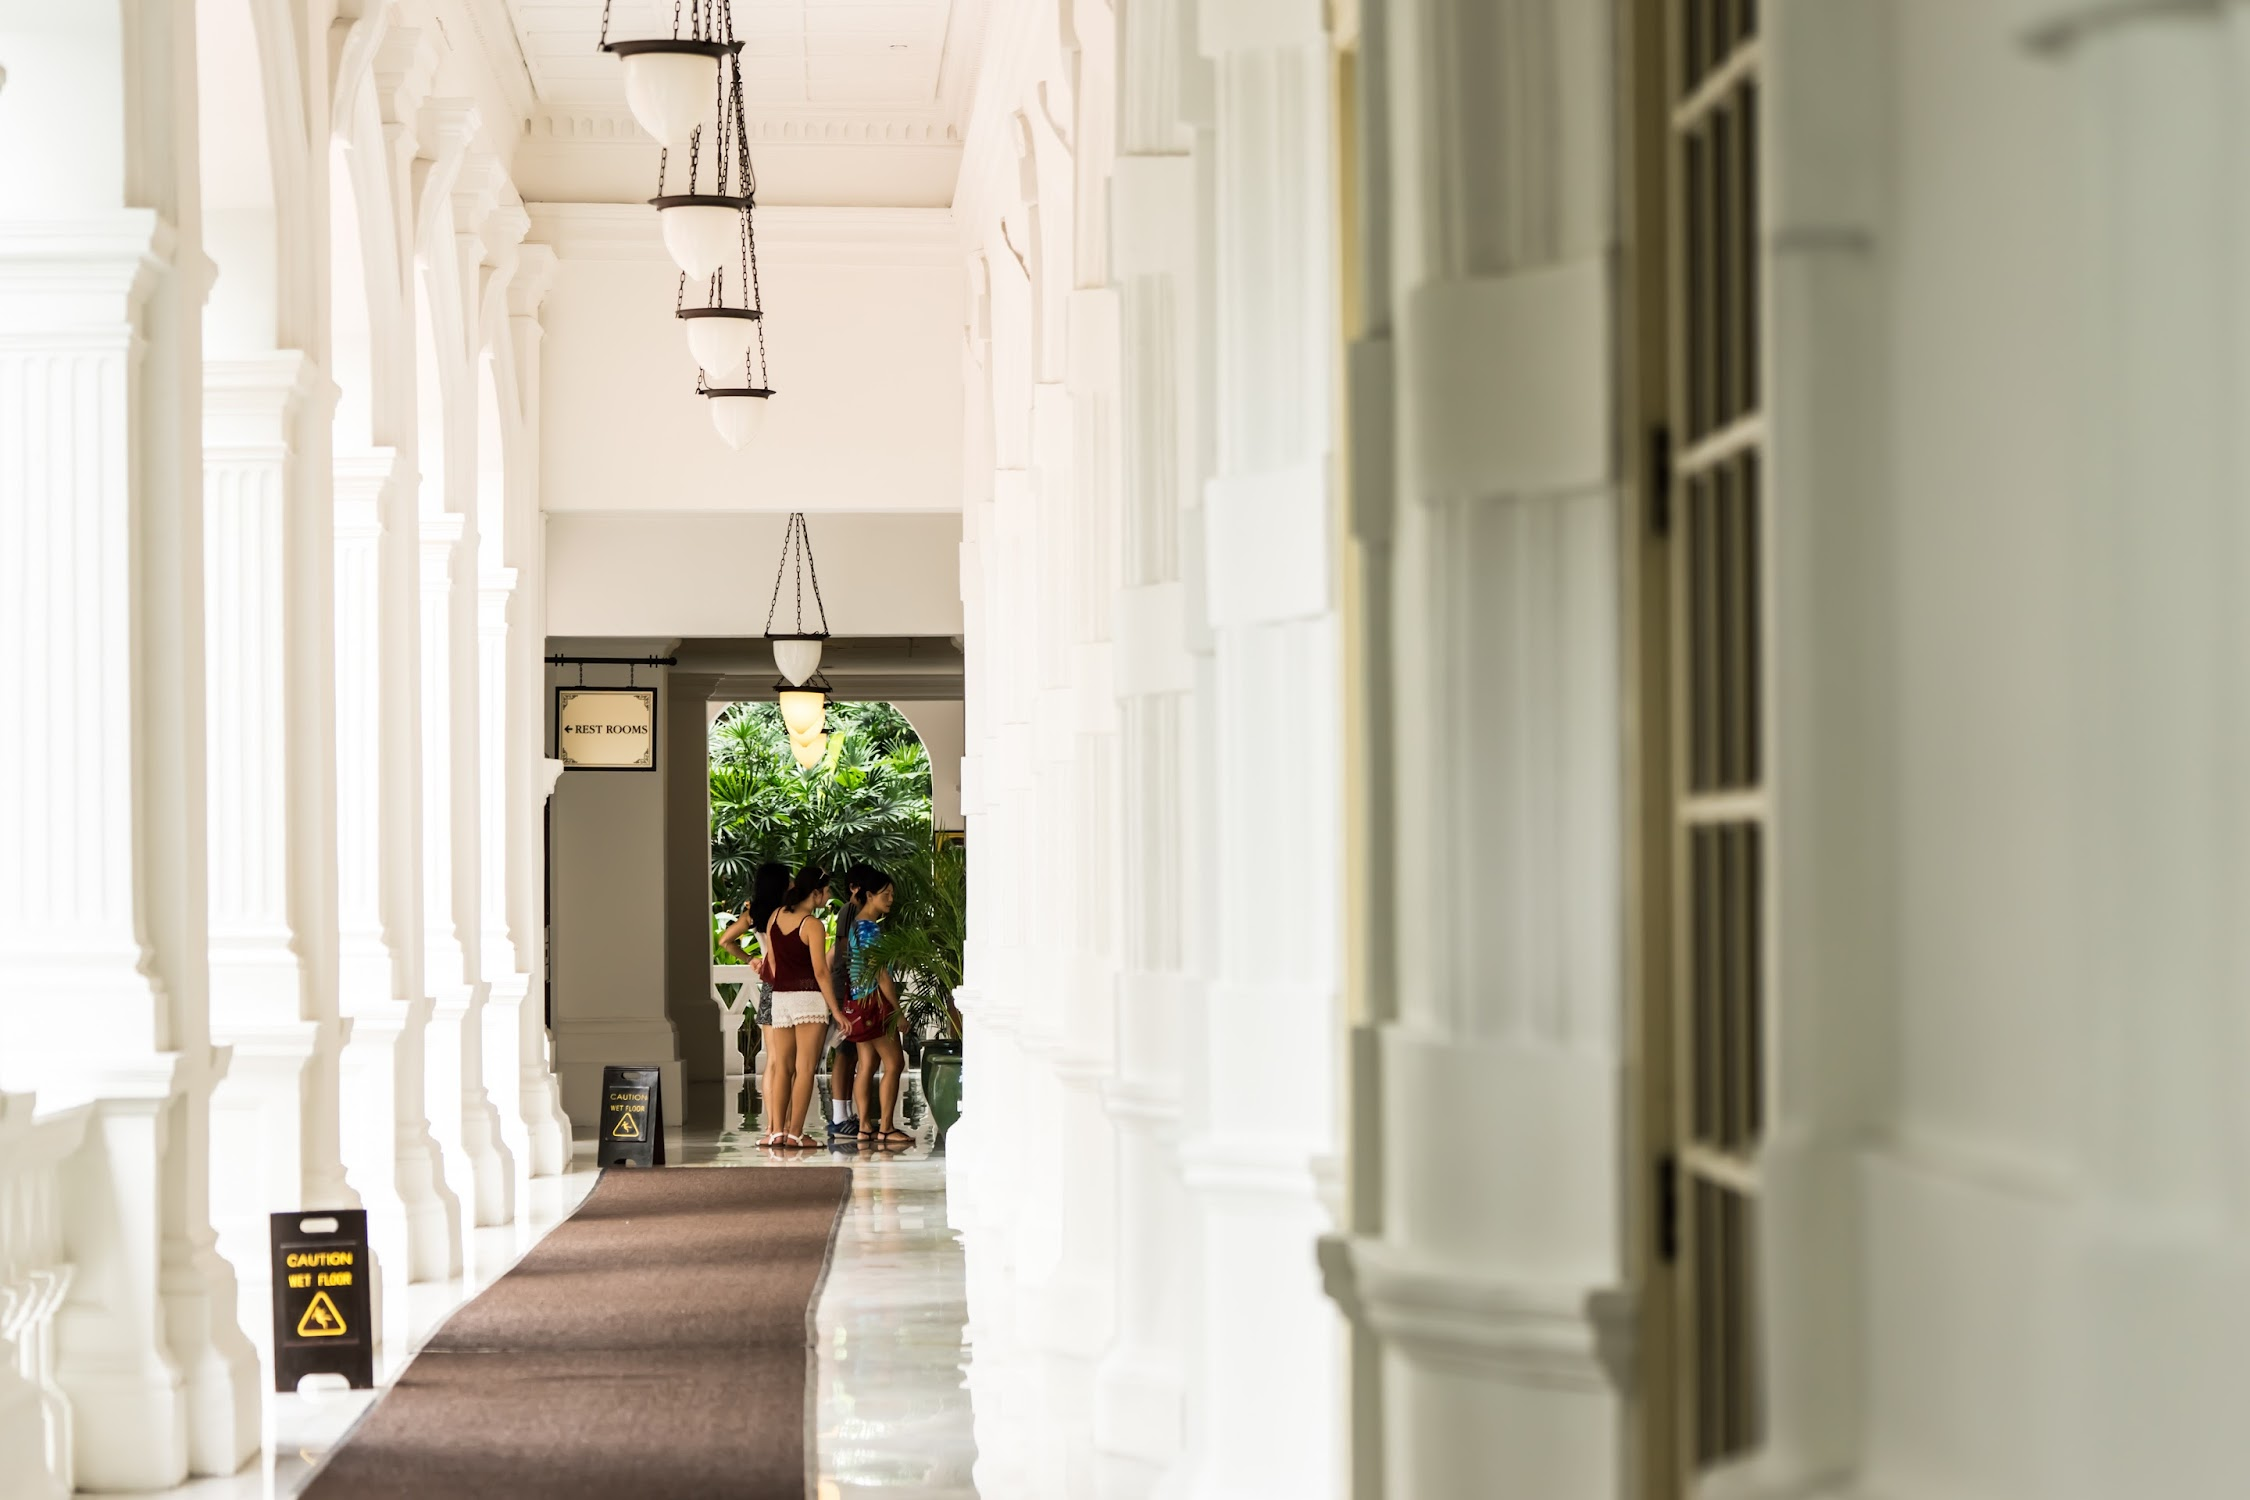 Singapore Raffles Hotel3